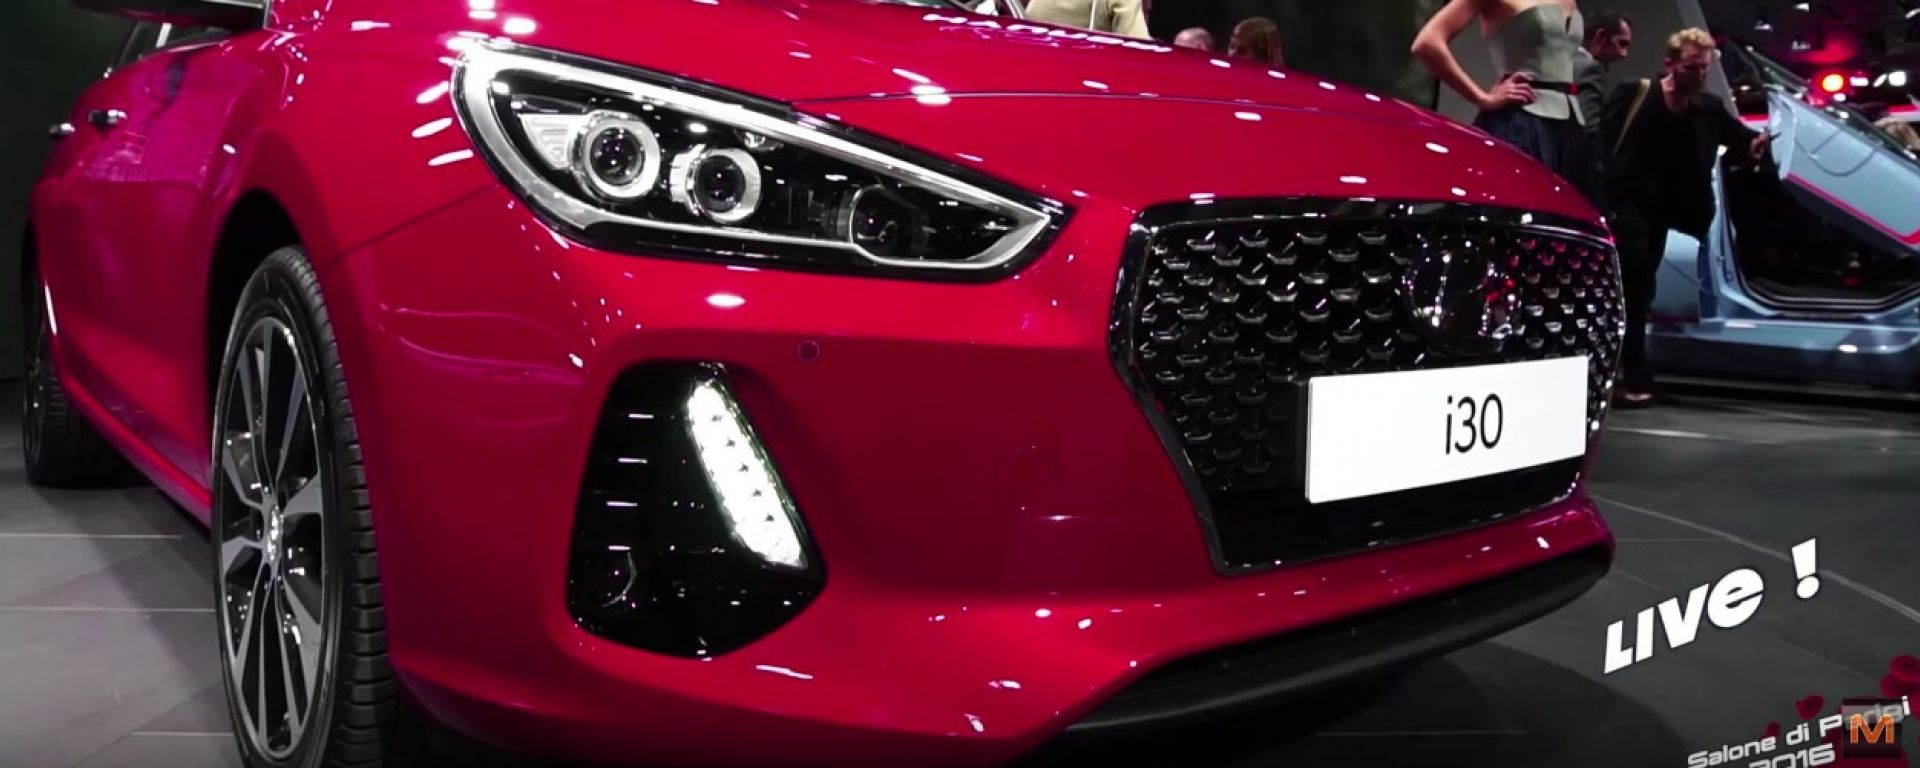 Live Parigi 2016: nuova Hyundai i30 e i10 restyling in video